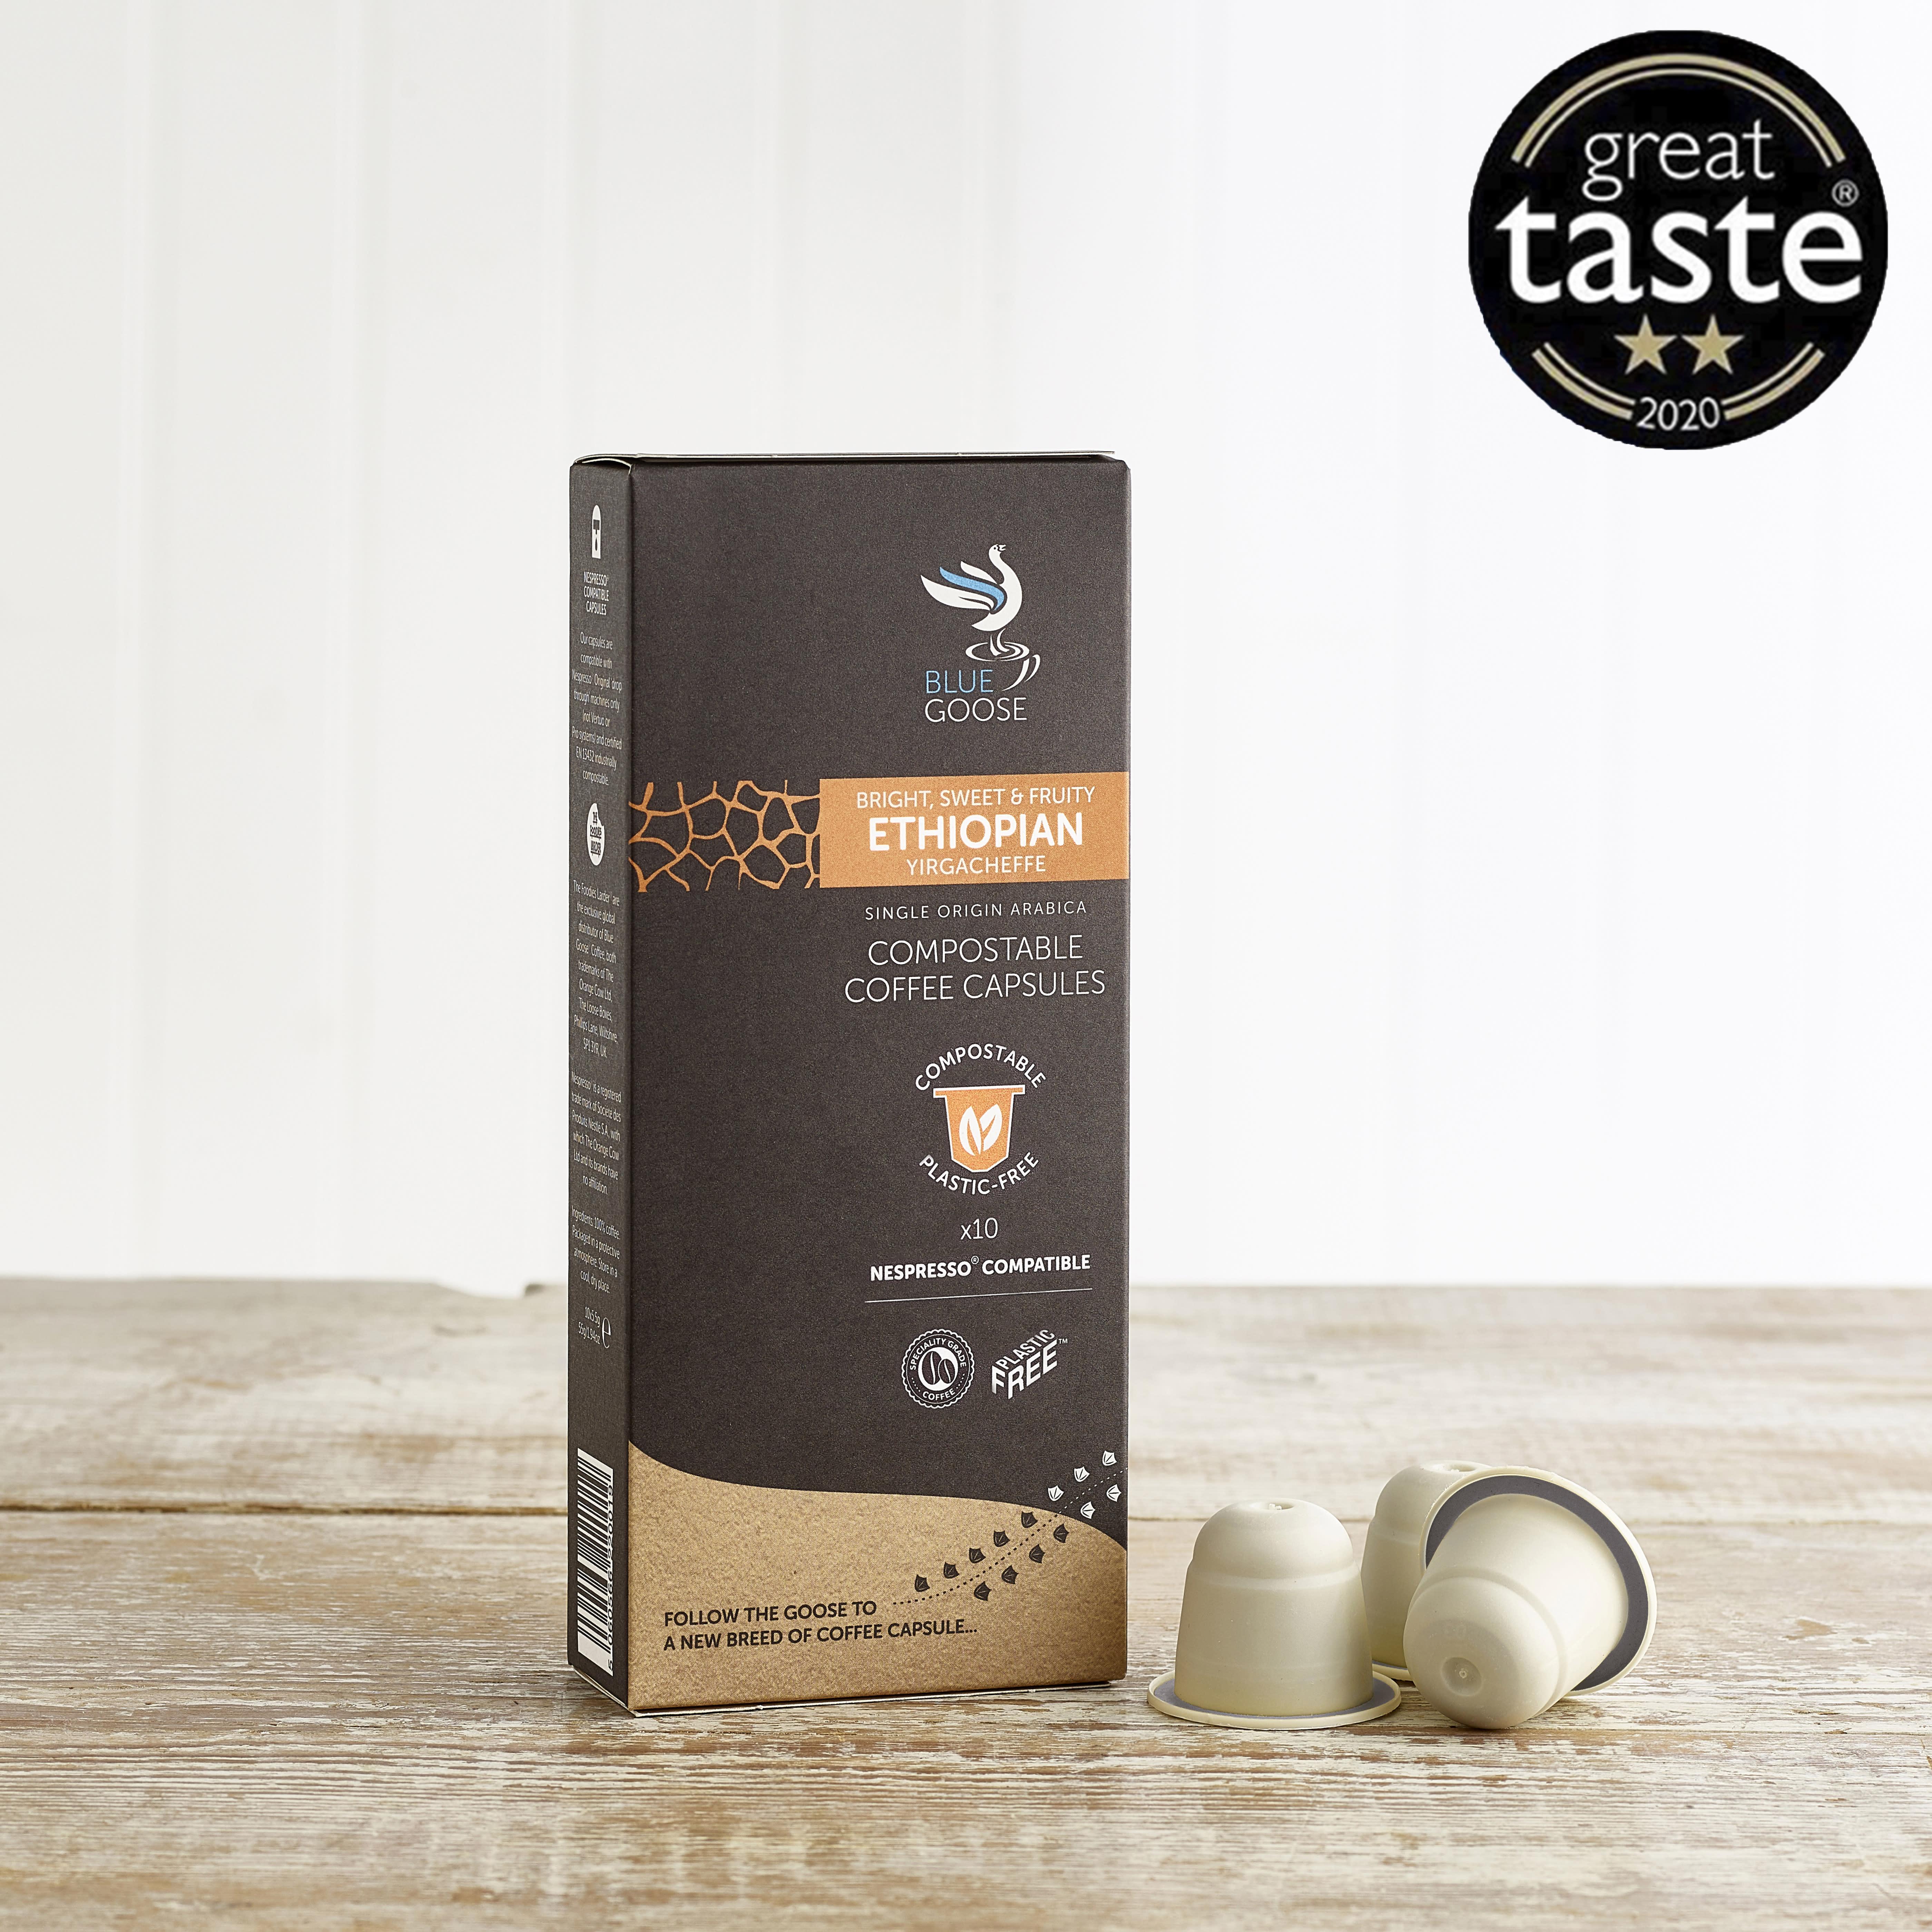 Blue Goose Ethiopian Yirgacheffe Eco Coffee Capsules, 10 Pack